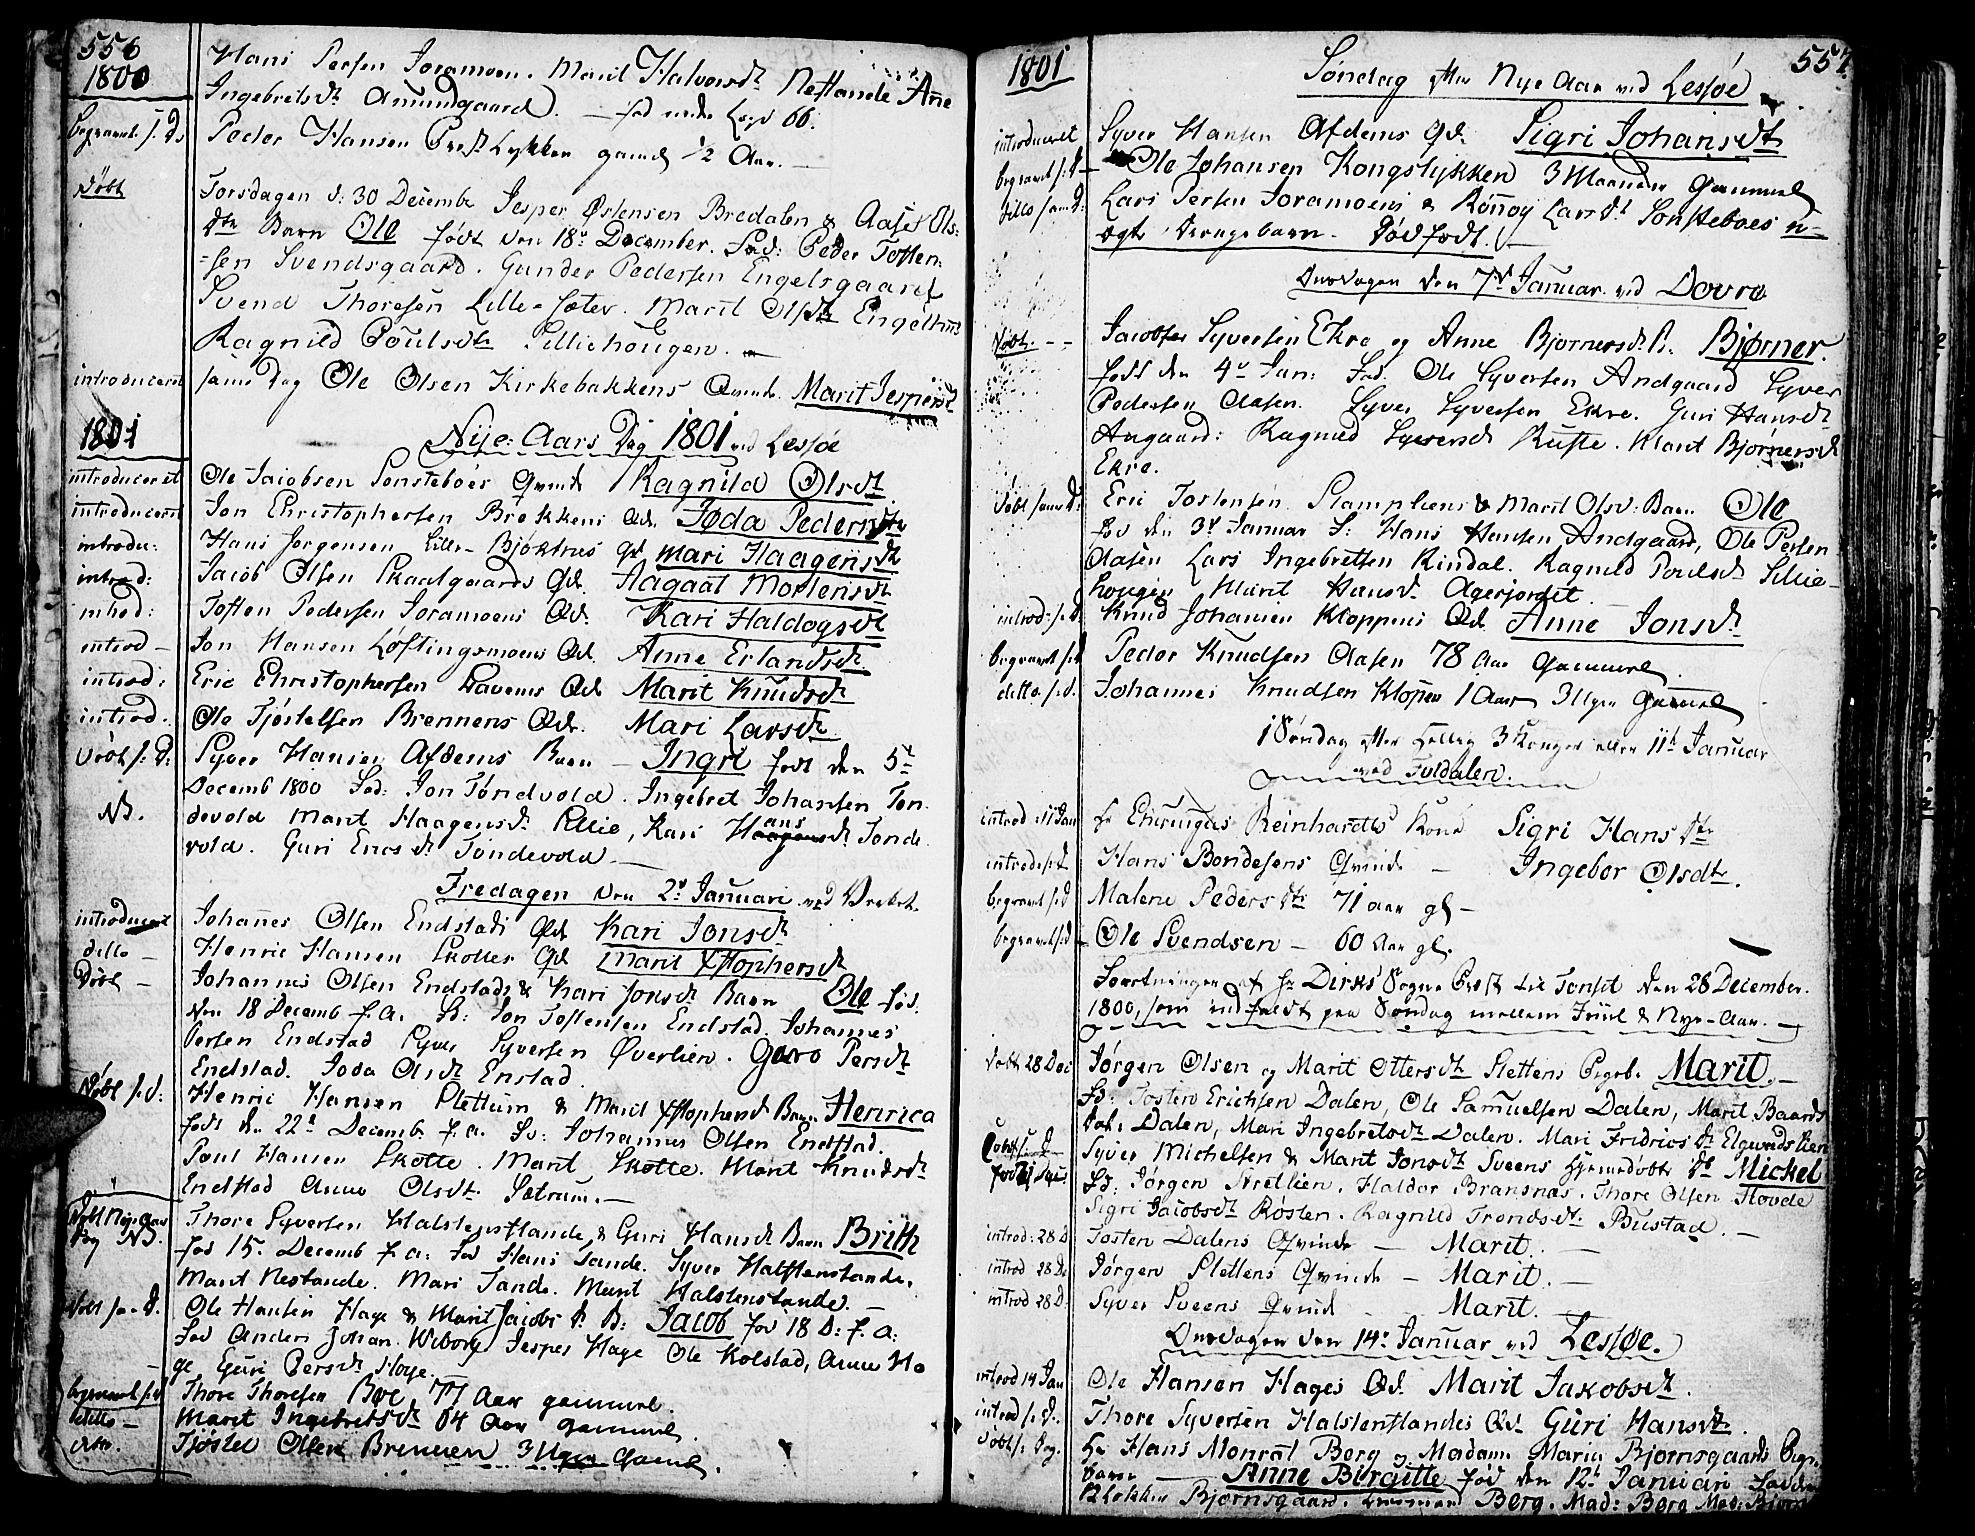 SAH, Lesja prestekontor, Ministerialbok nr. 3, 1777-1819, s. 556-557